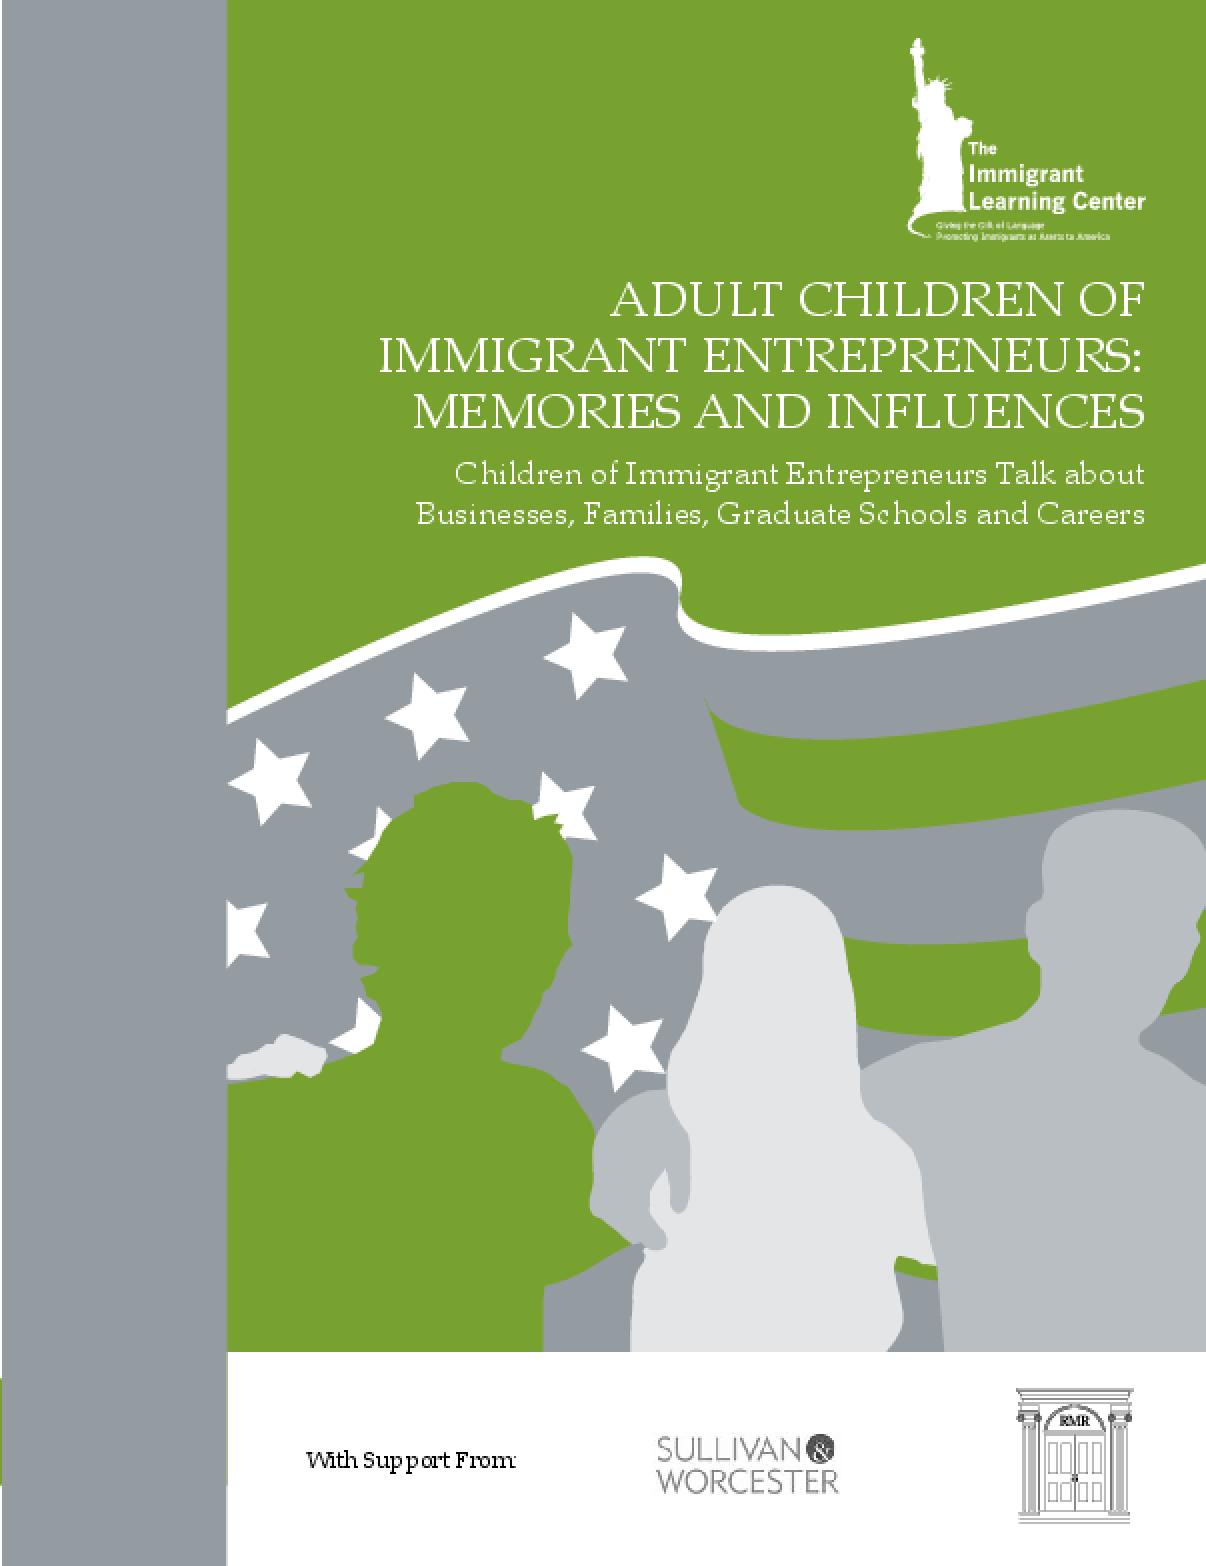 Adult Children of Immigrant Entrepreneurs: Memories and Influences